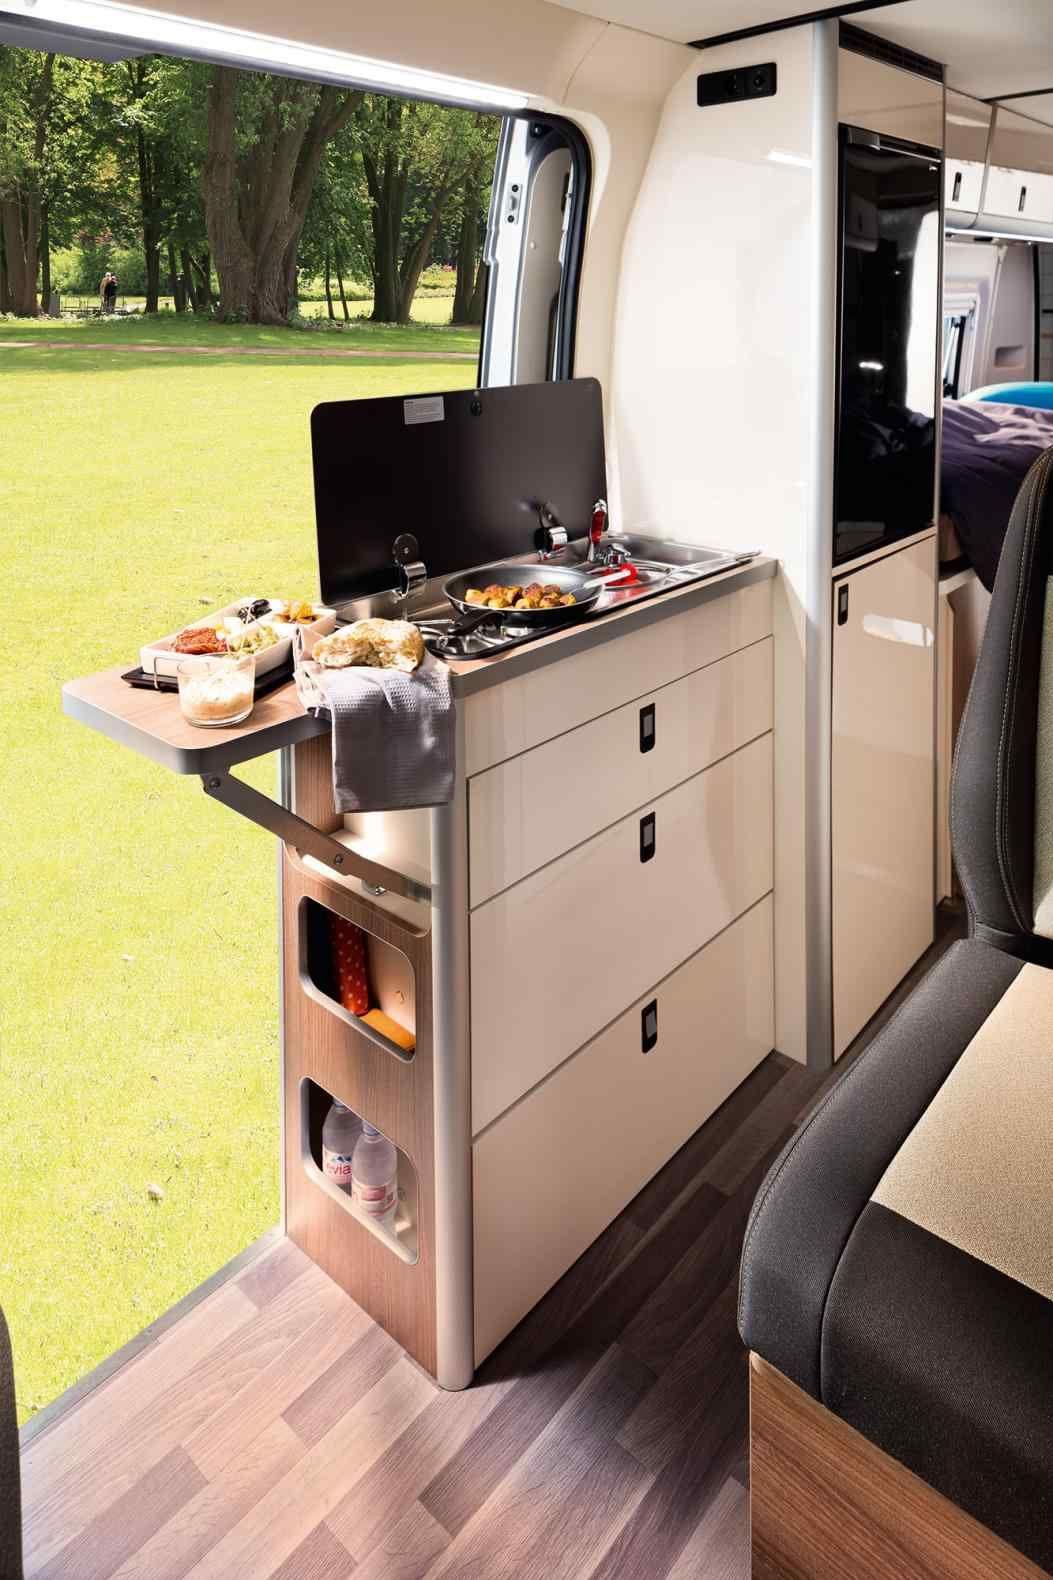 Ford Transit Campervan Conversion Interior Furniture Camper Van Van Interior Ford Transit Camper Campervan Interior